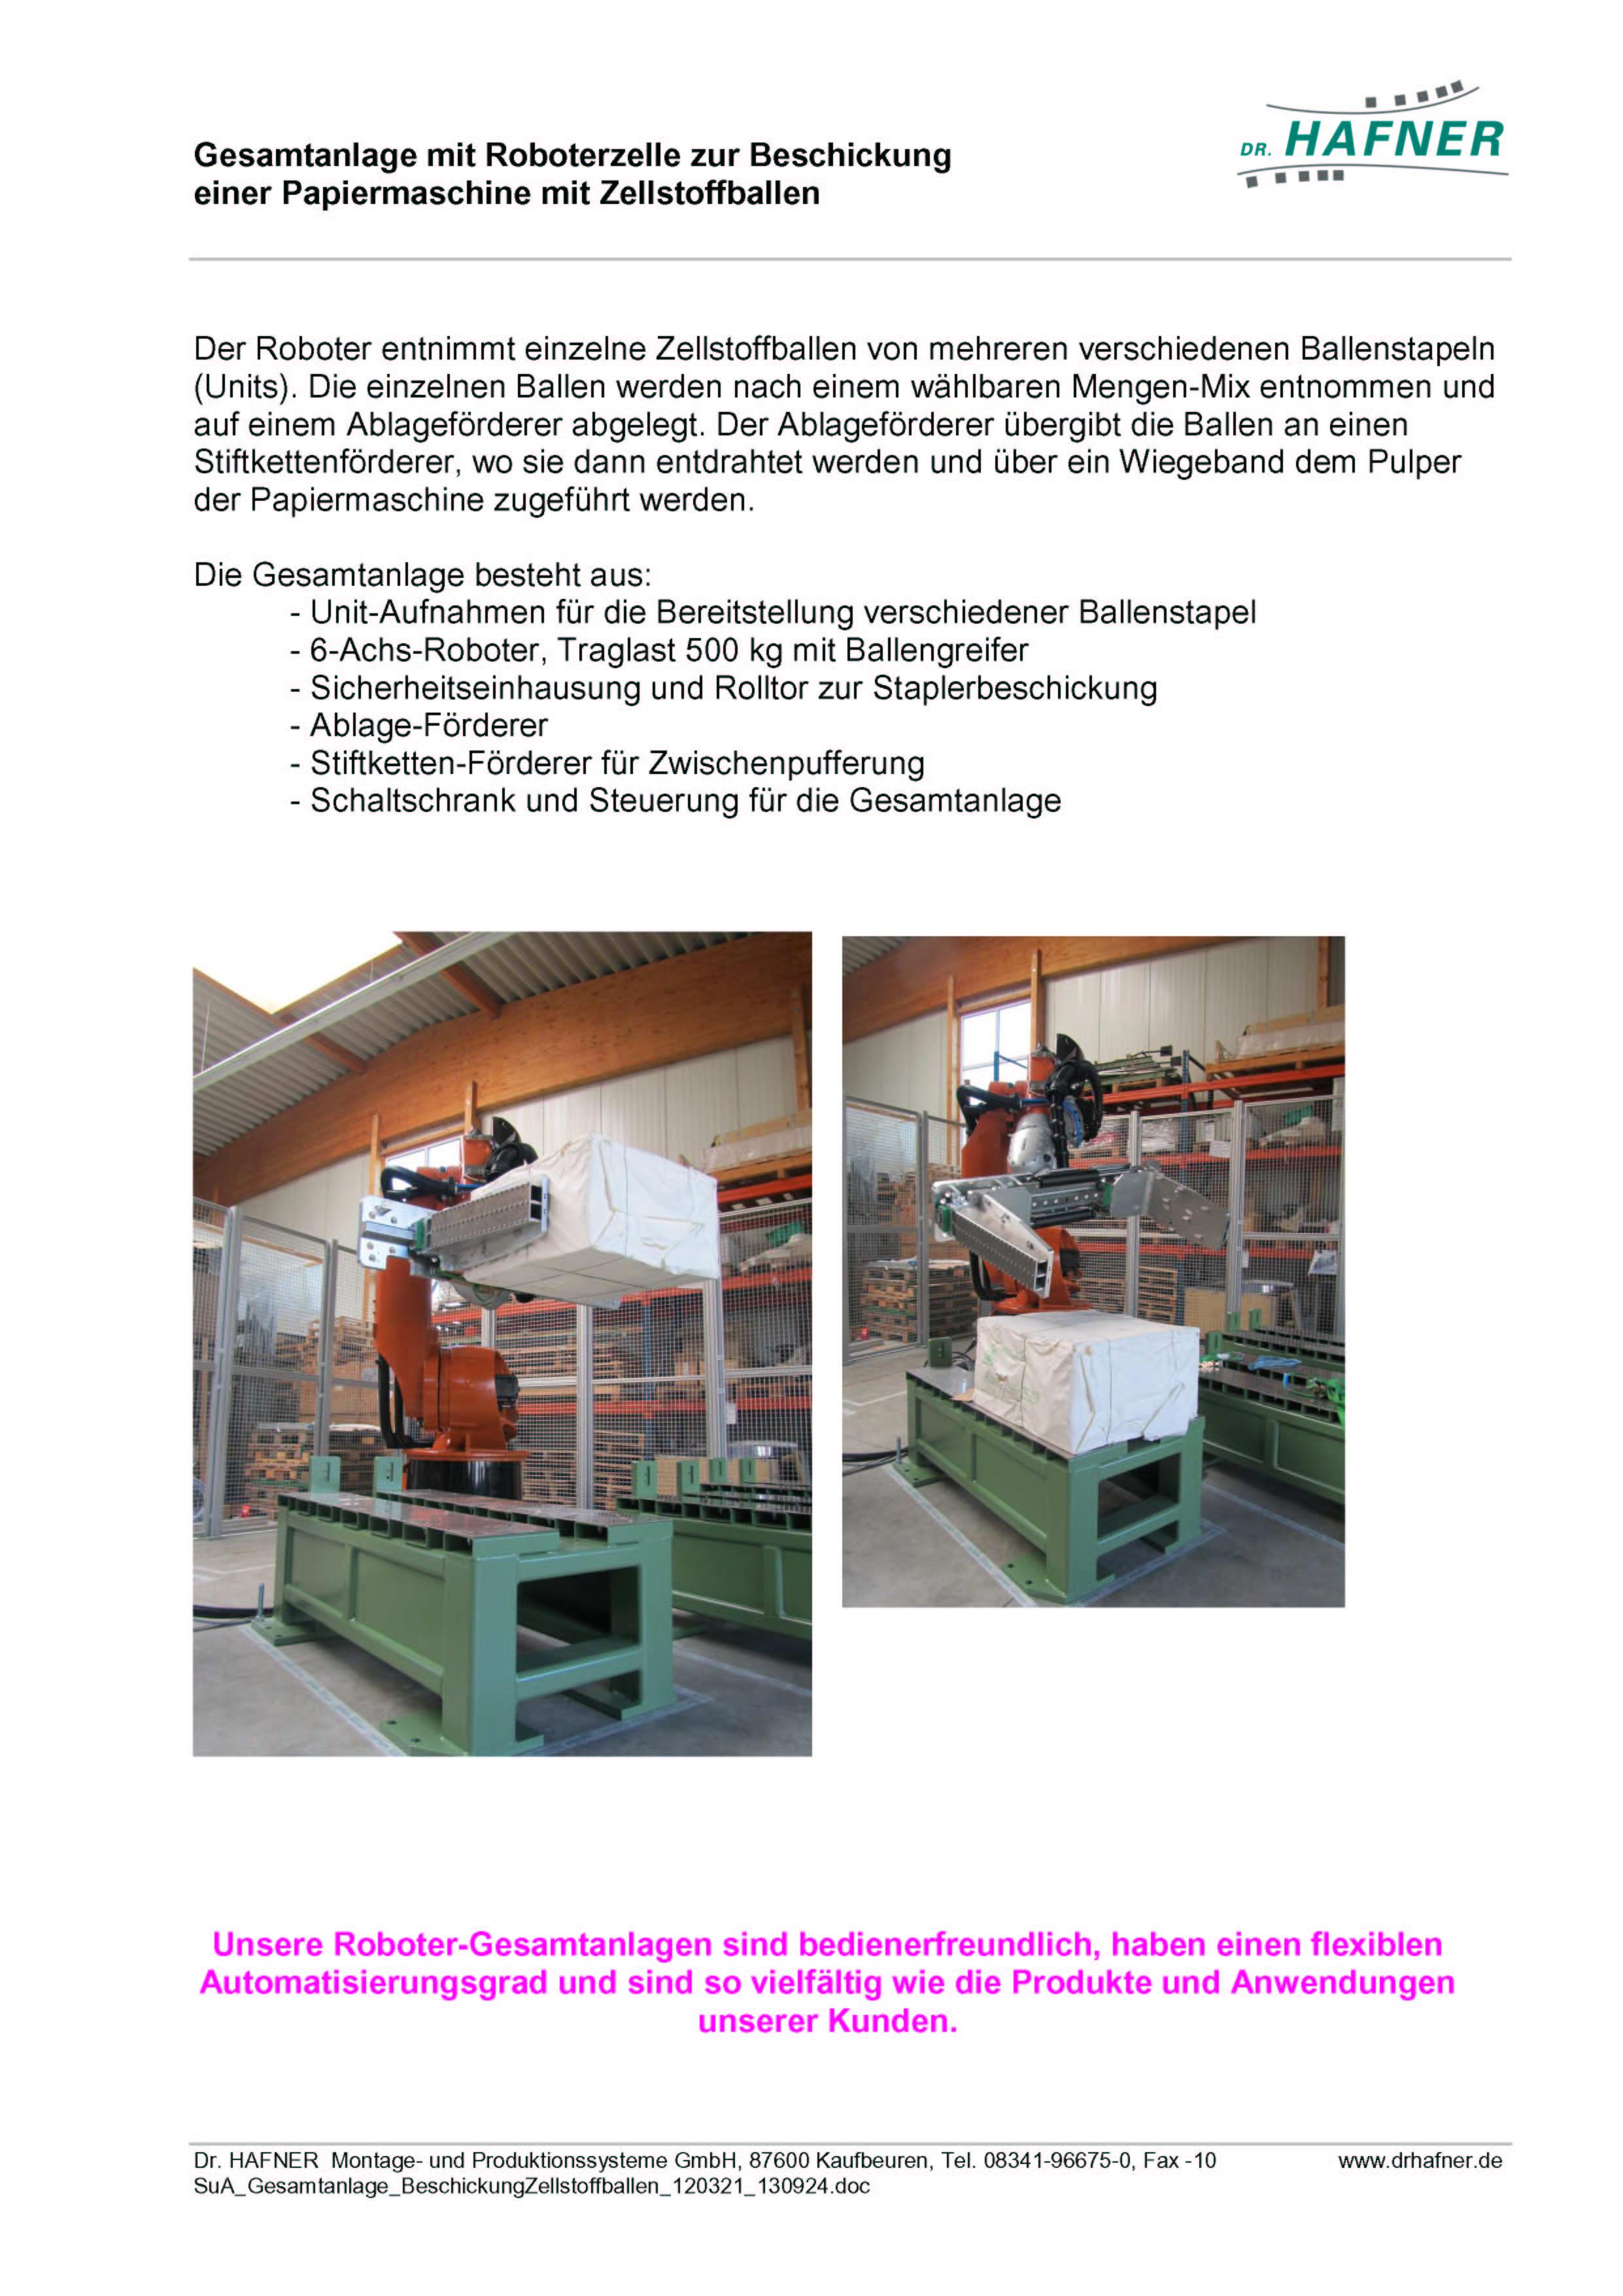 Dr. HAFNER_PKWP_58 Roboter Beschickung Papiermaschine Zellstoffballen